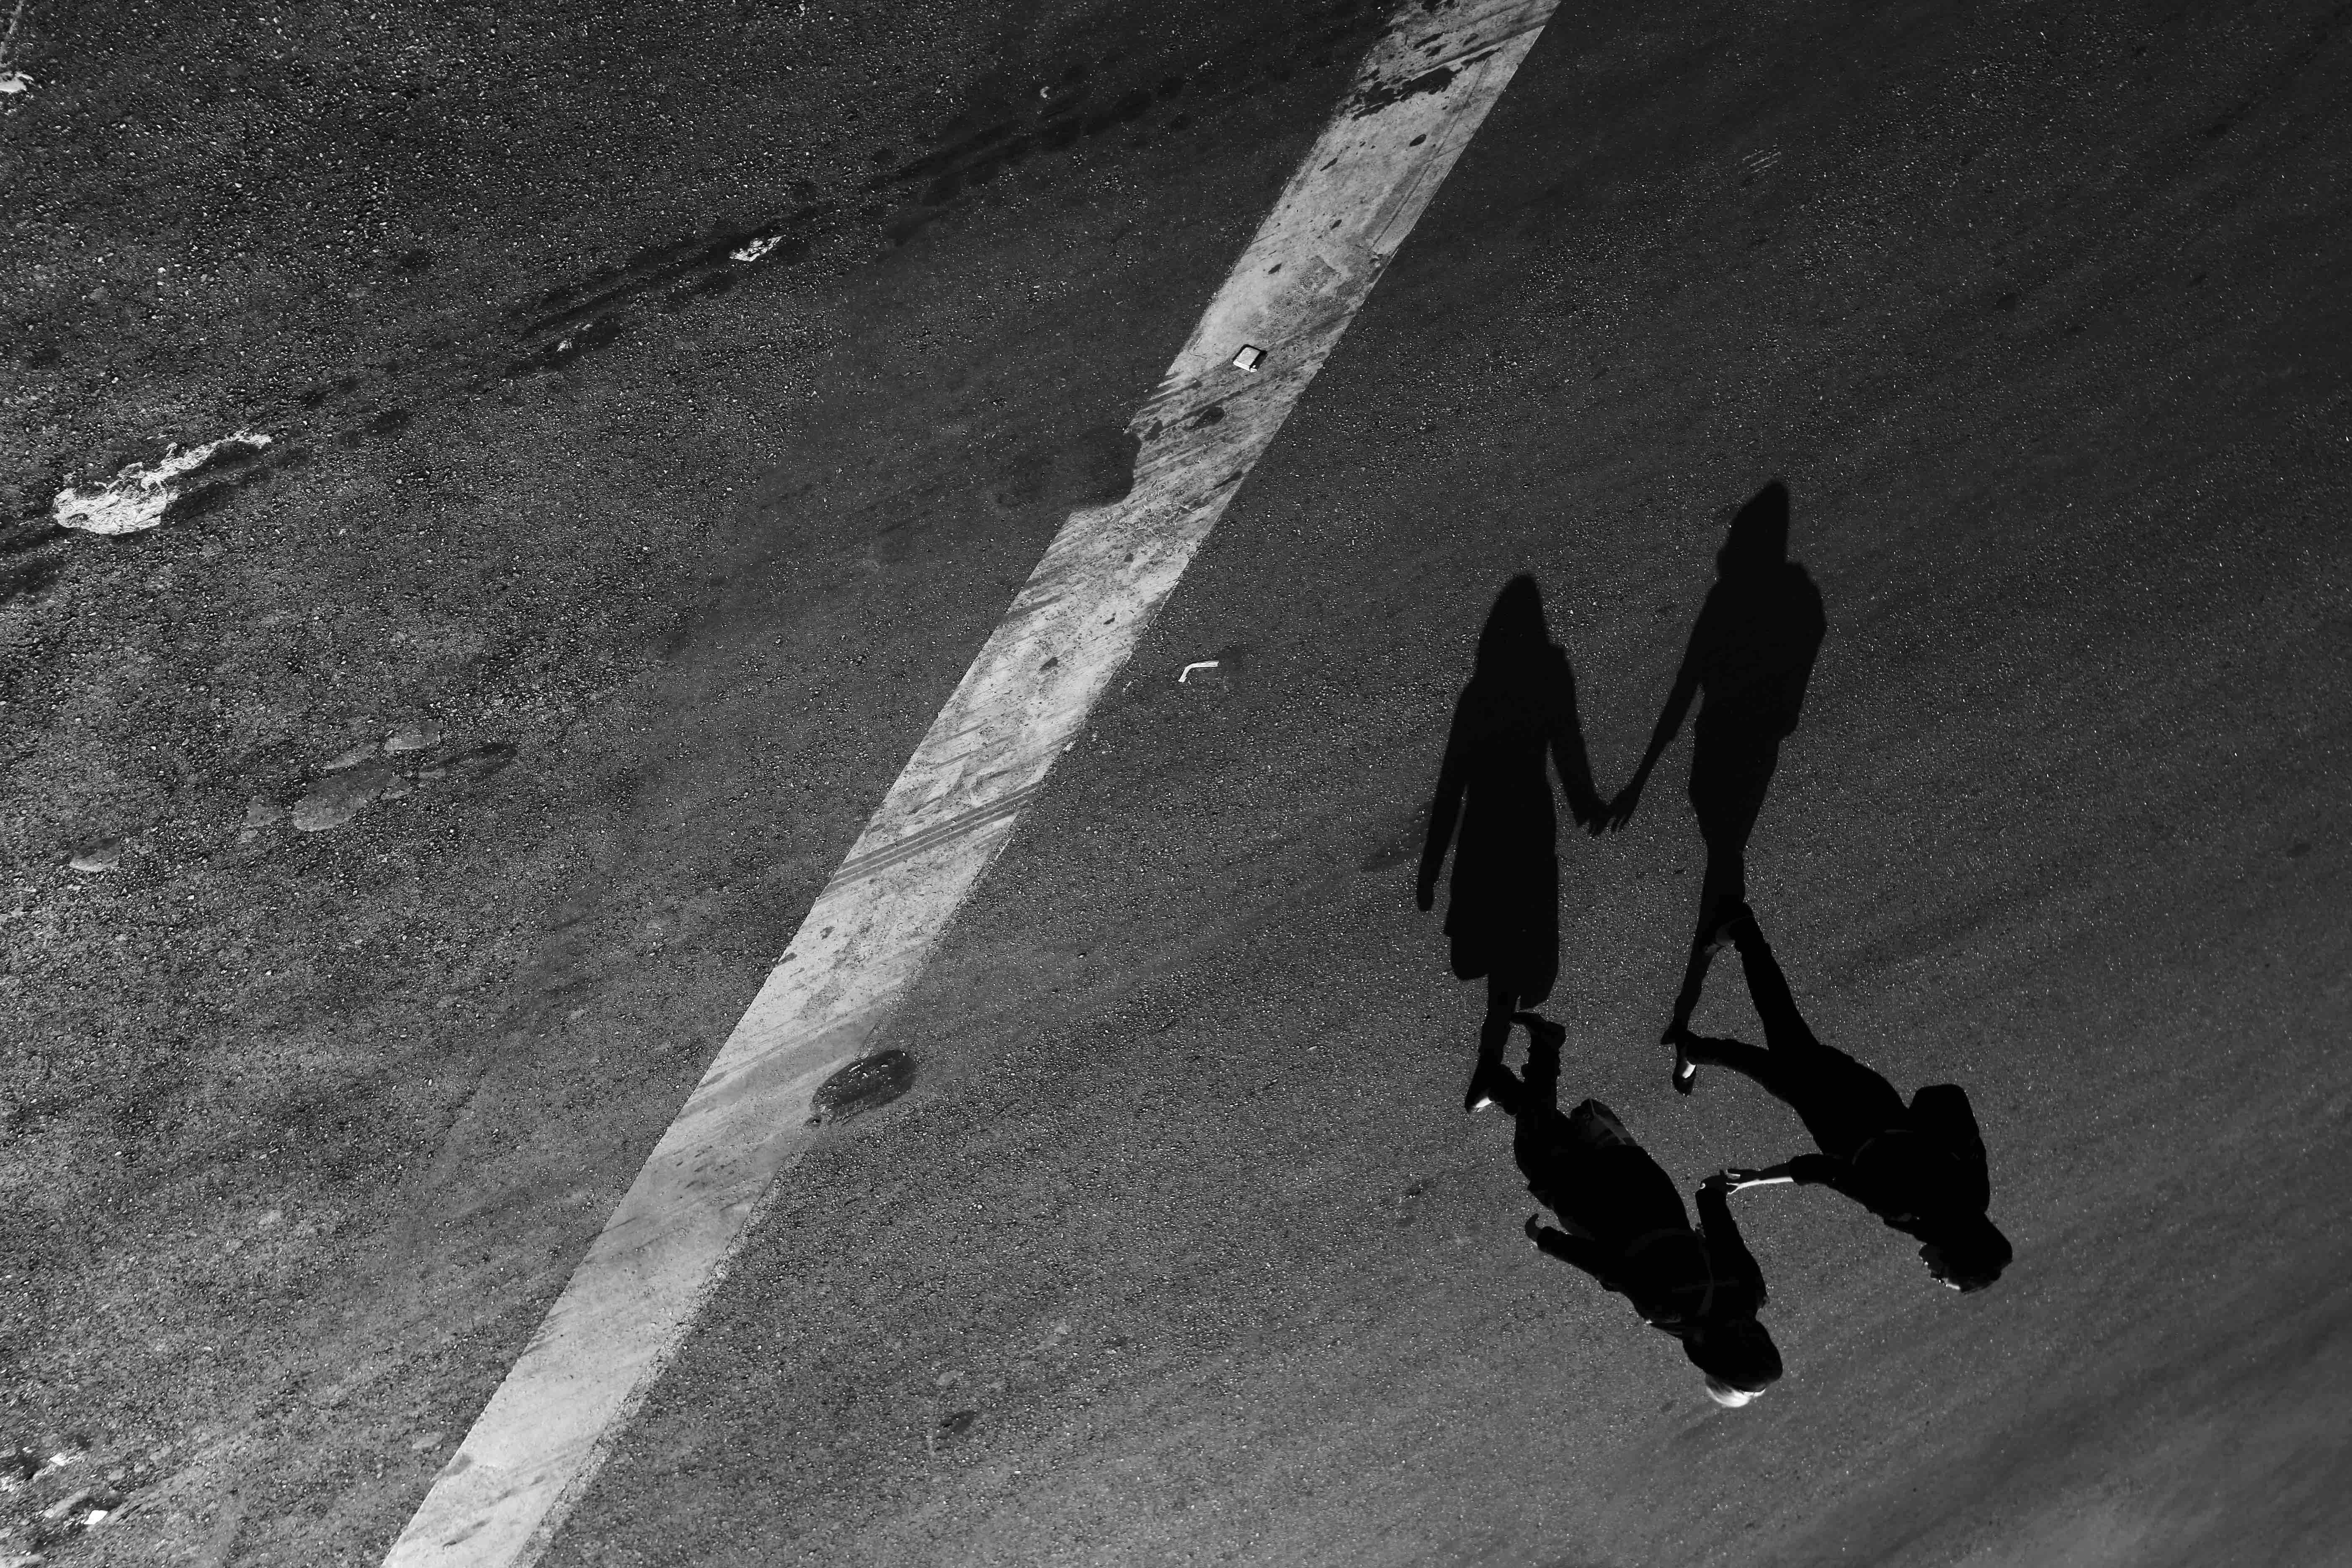 Untitled (16)_ The Life Of Shadows Series - Nehdaran_ Dana